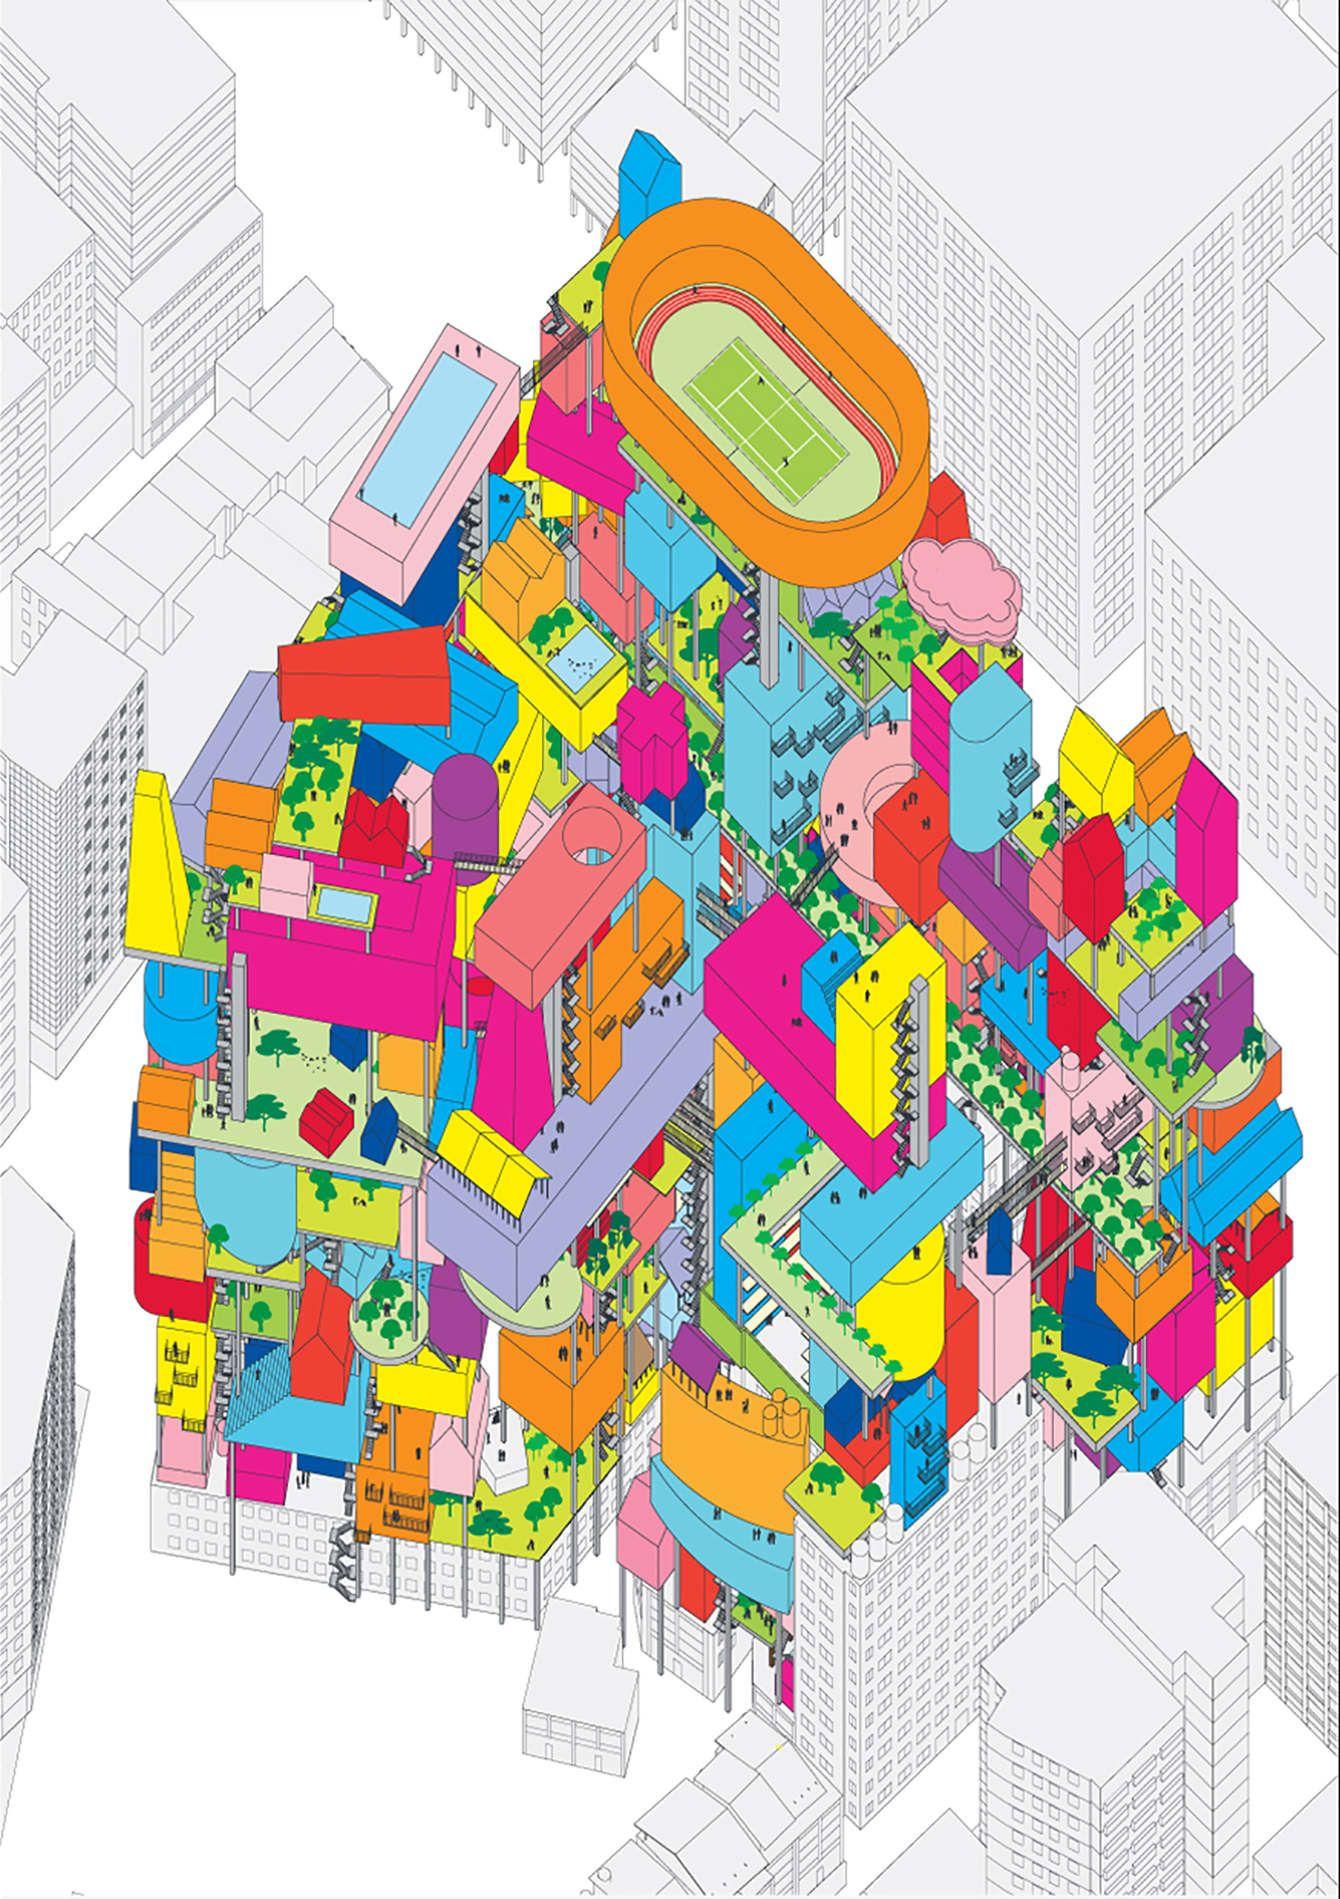 MVRDV - Vertical Village - Google 搜索 | elements for thesis